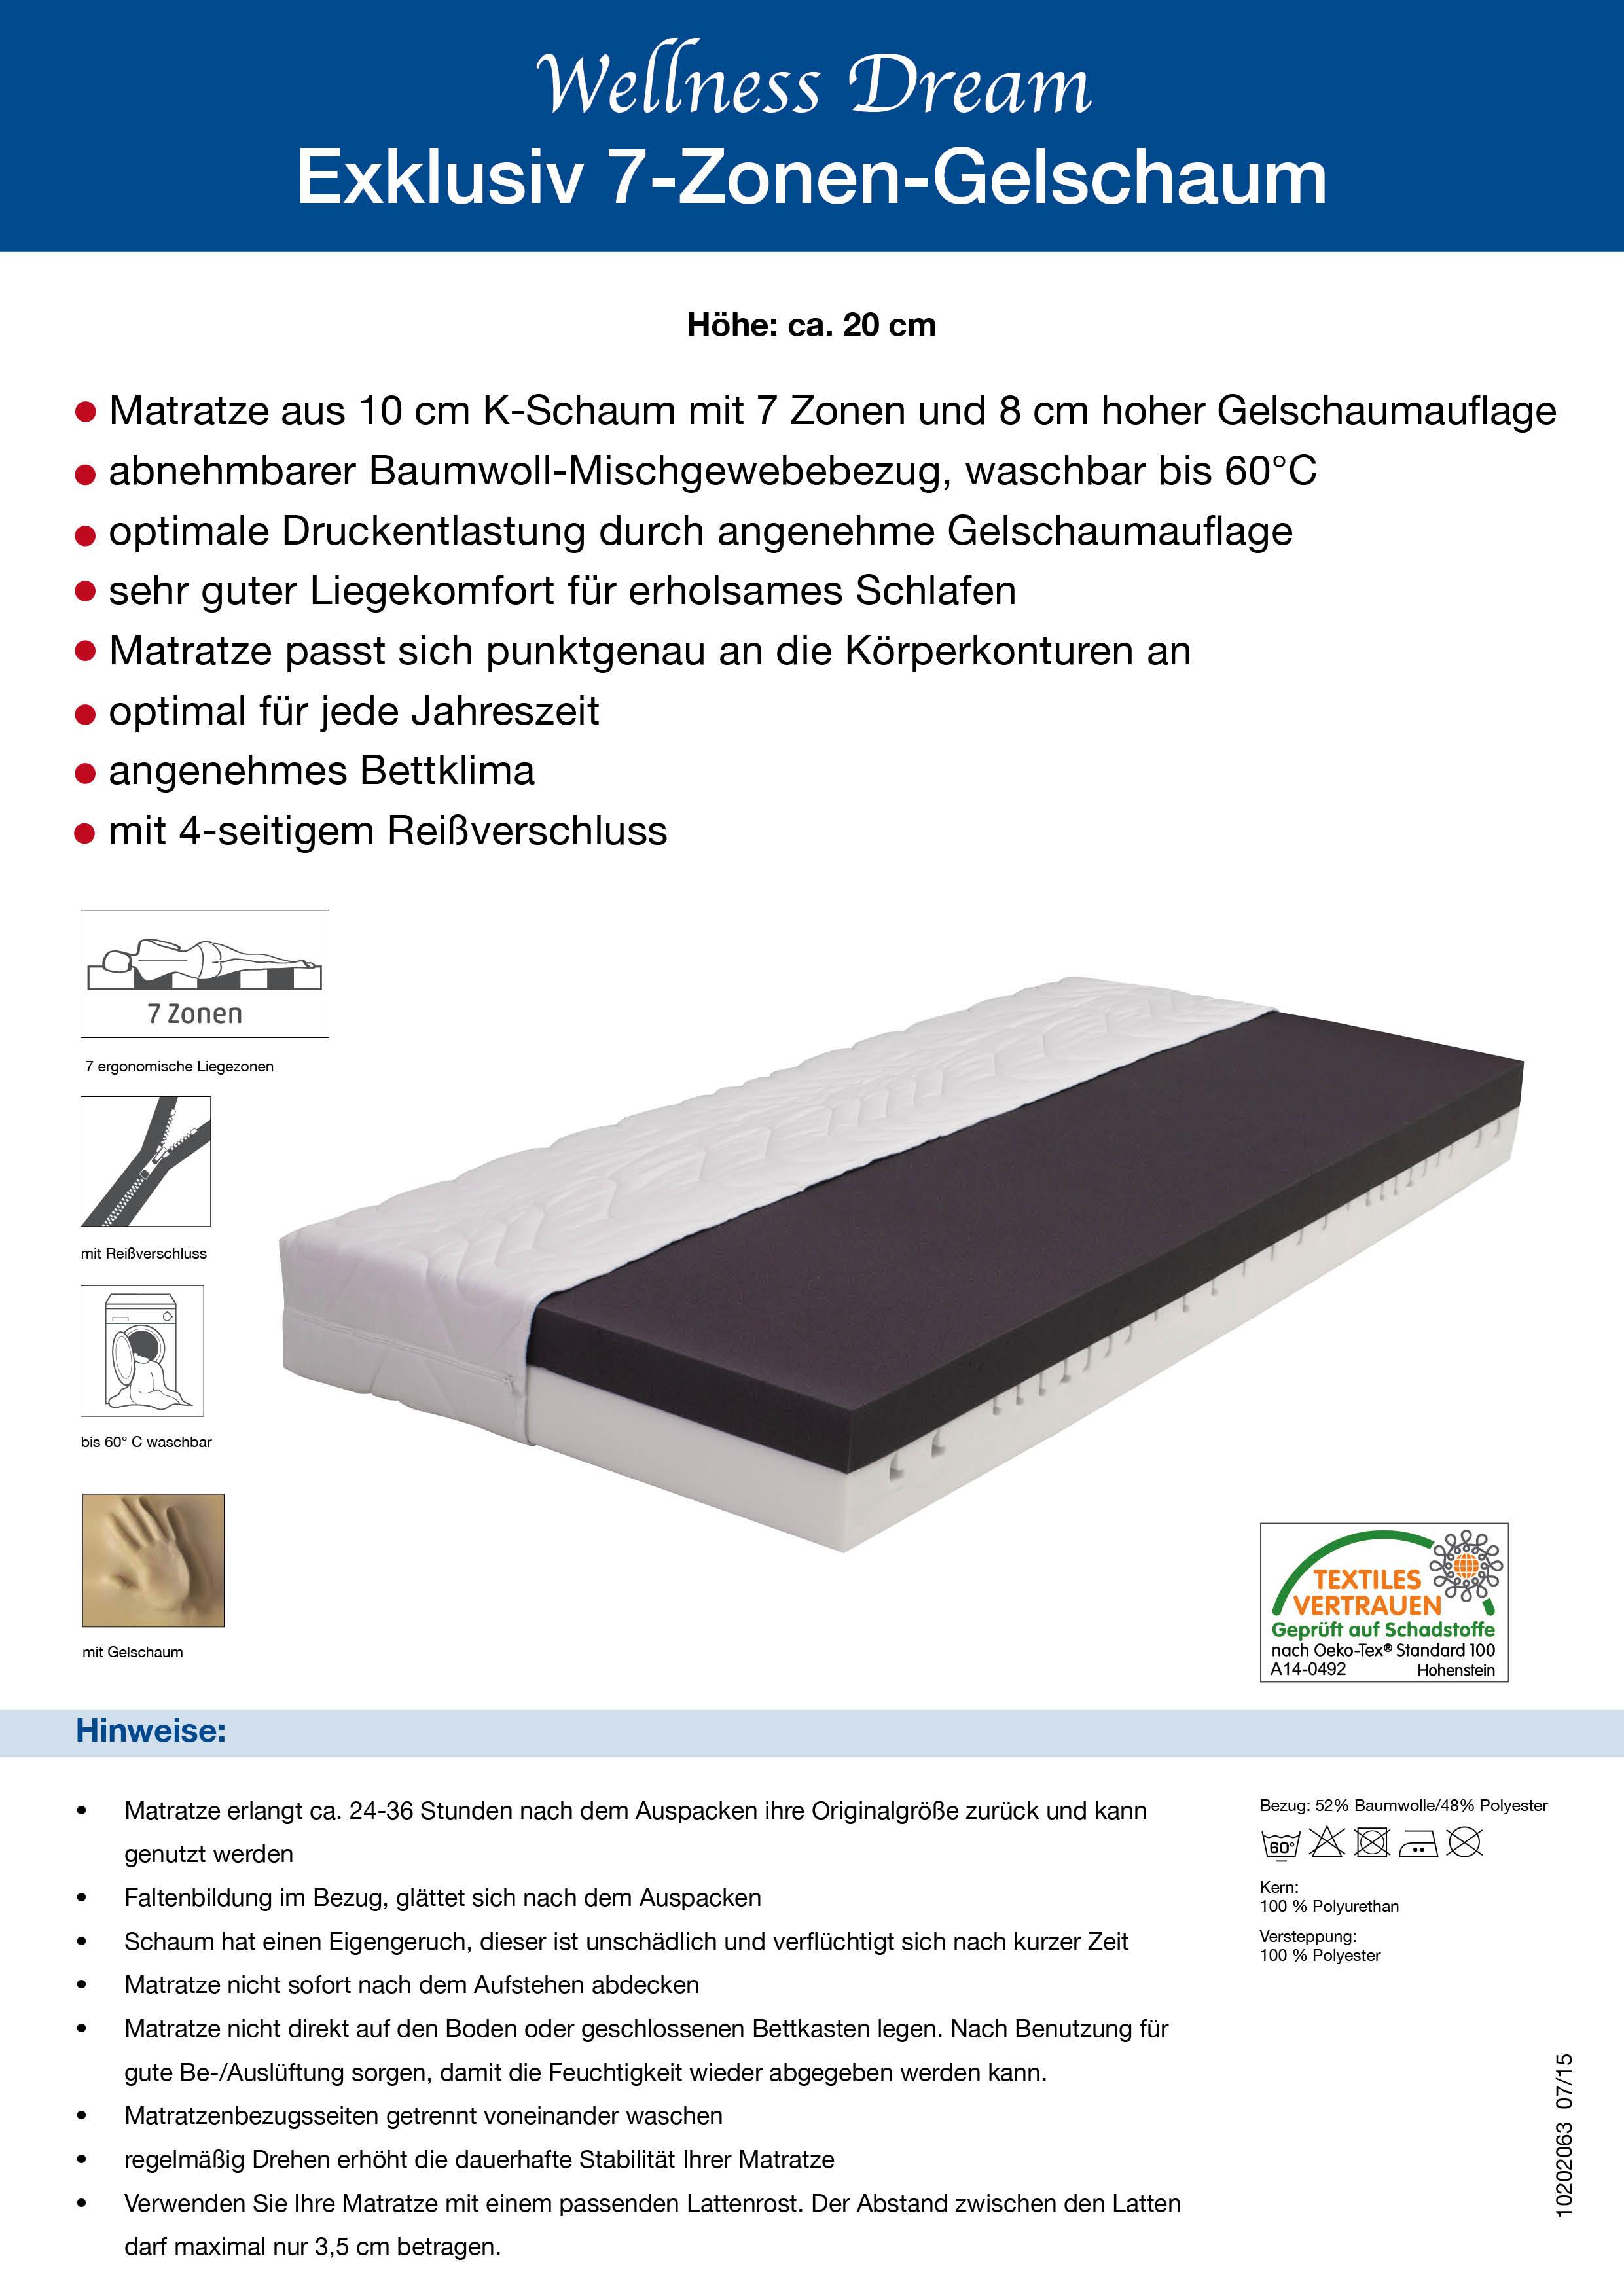 20 cm 7 zonen gelschaum matratze wellness dream alle gr en w hlbar ebay. Black Bedroom Furniture Sets. Home Design Ideas